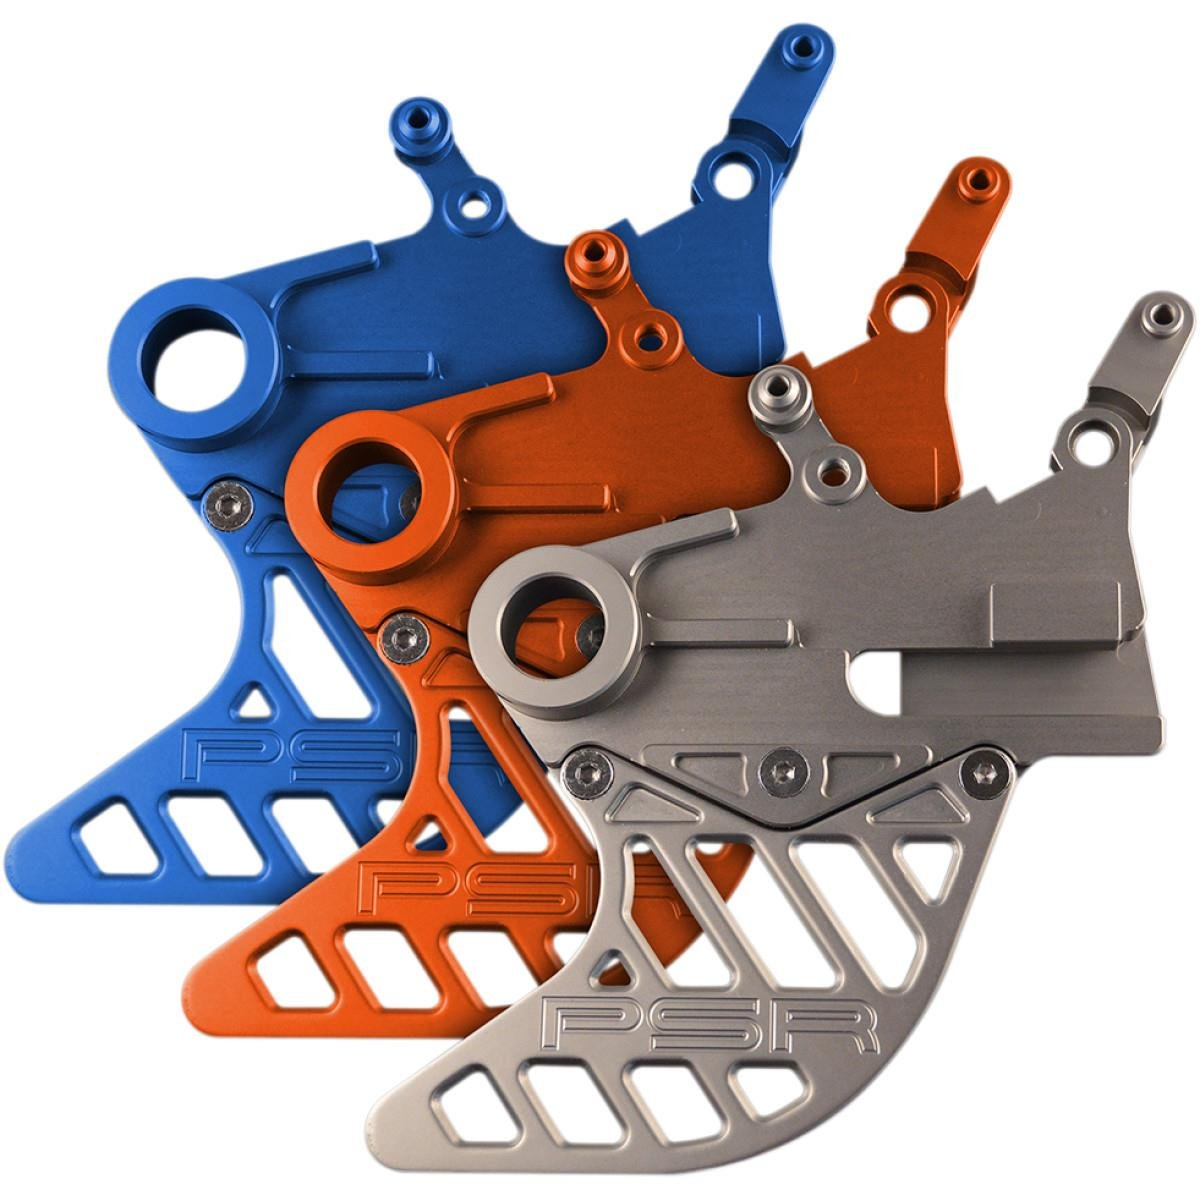 Powerstands Racing Rear Disc Guard - Orange 080410128